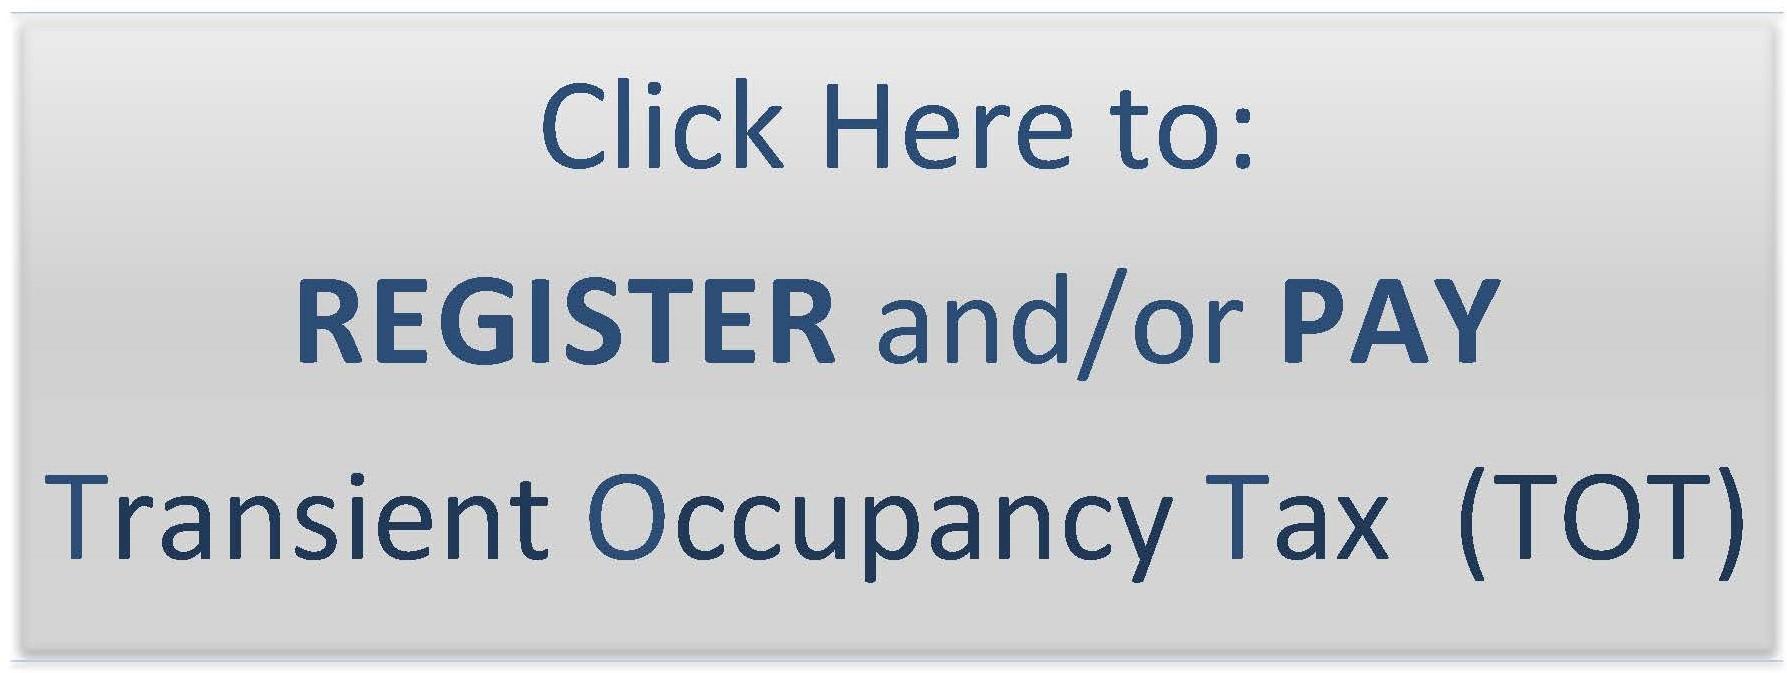 Transient Occupancy Tax (TOT) & Short-Term Rental Compliance